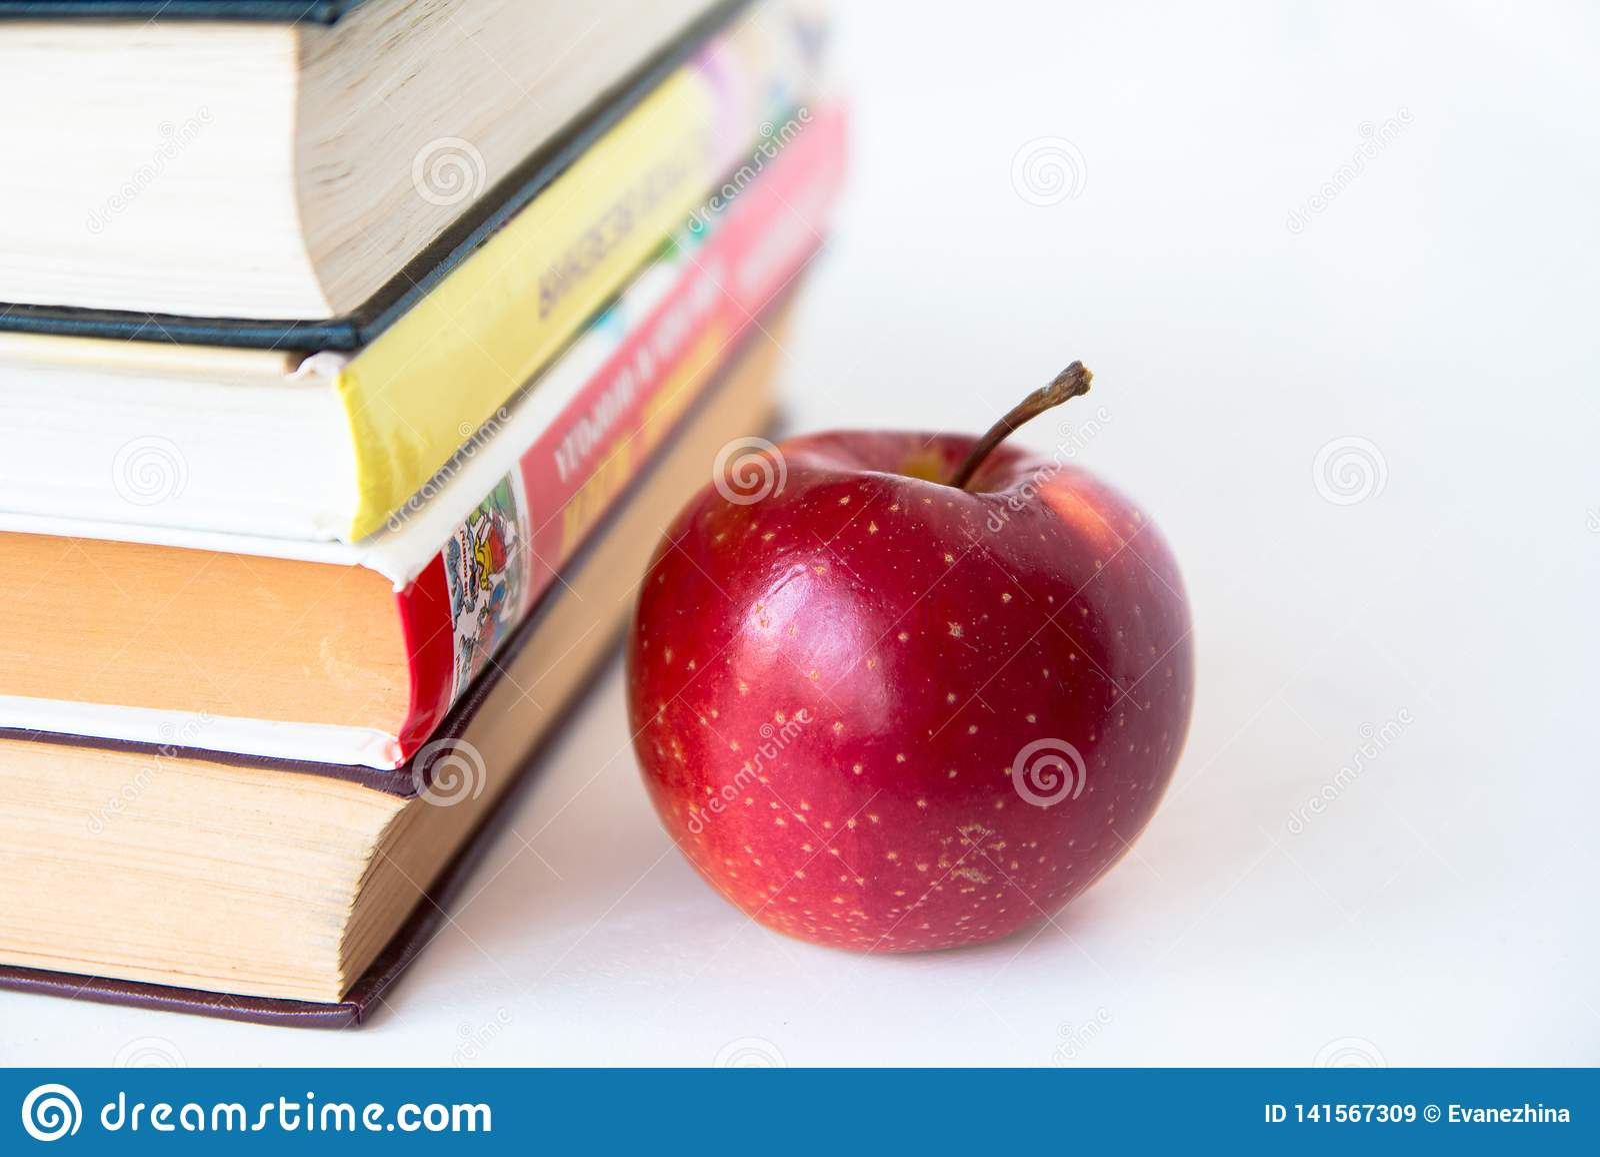 Mela succosa matura rossa vicino ai libri